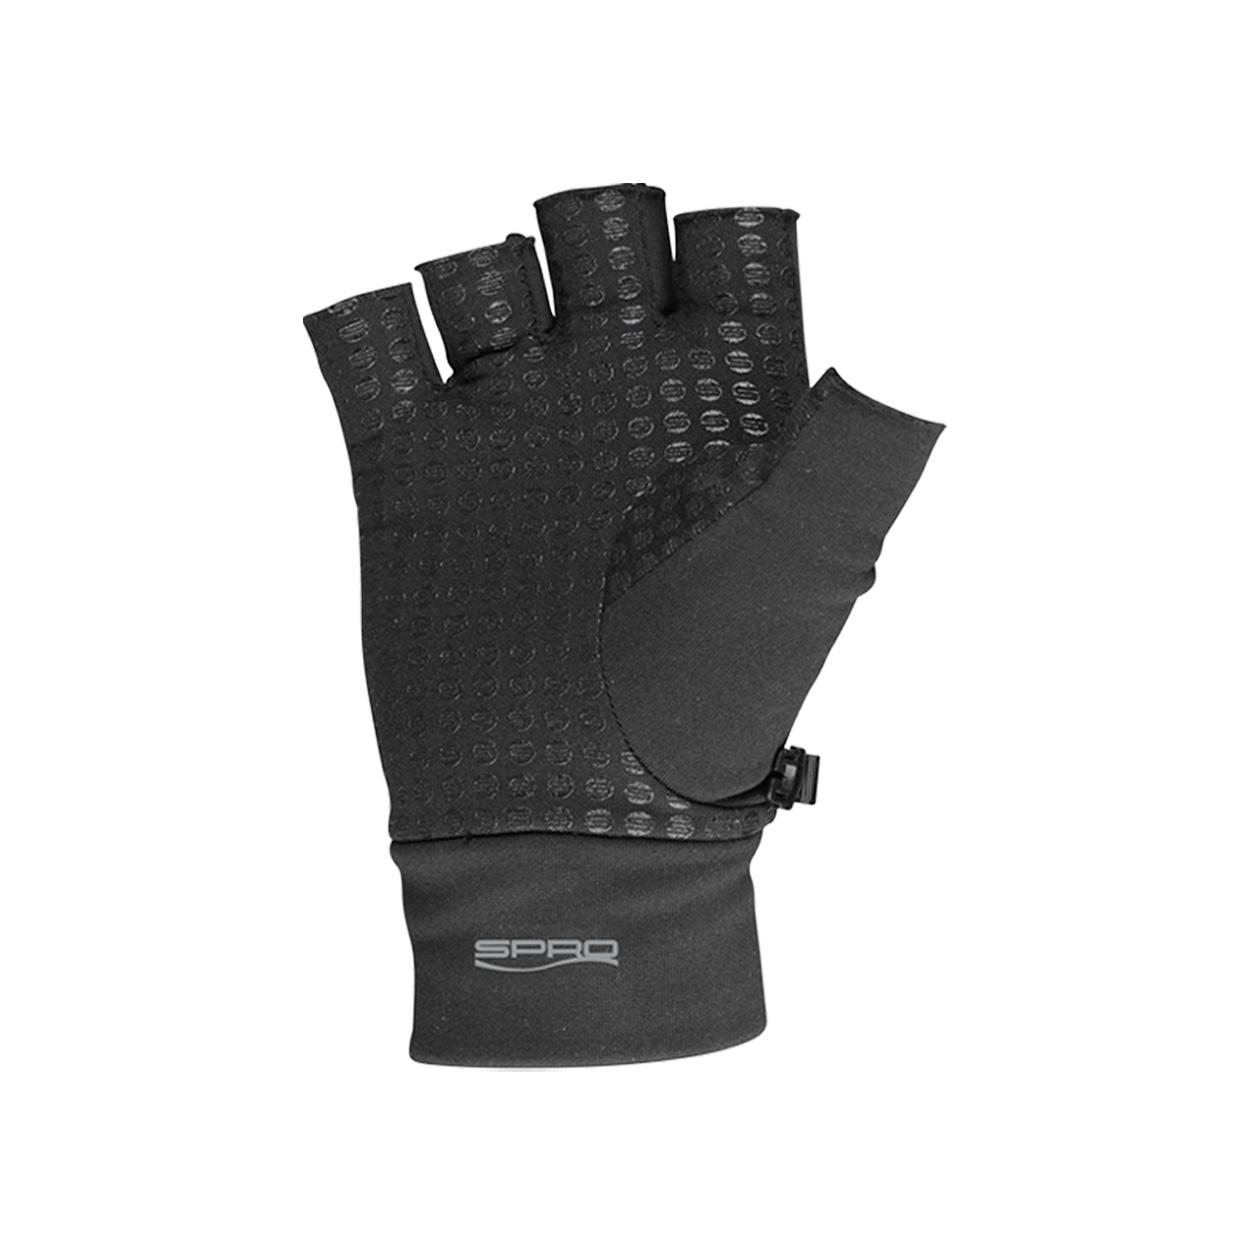 Shop Image - Fingerless Glove 02